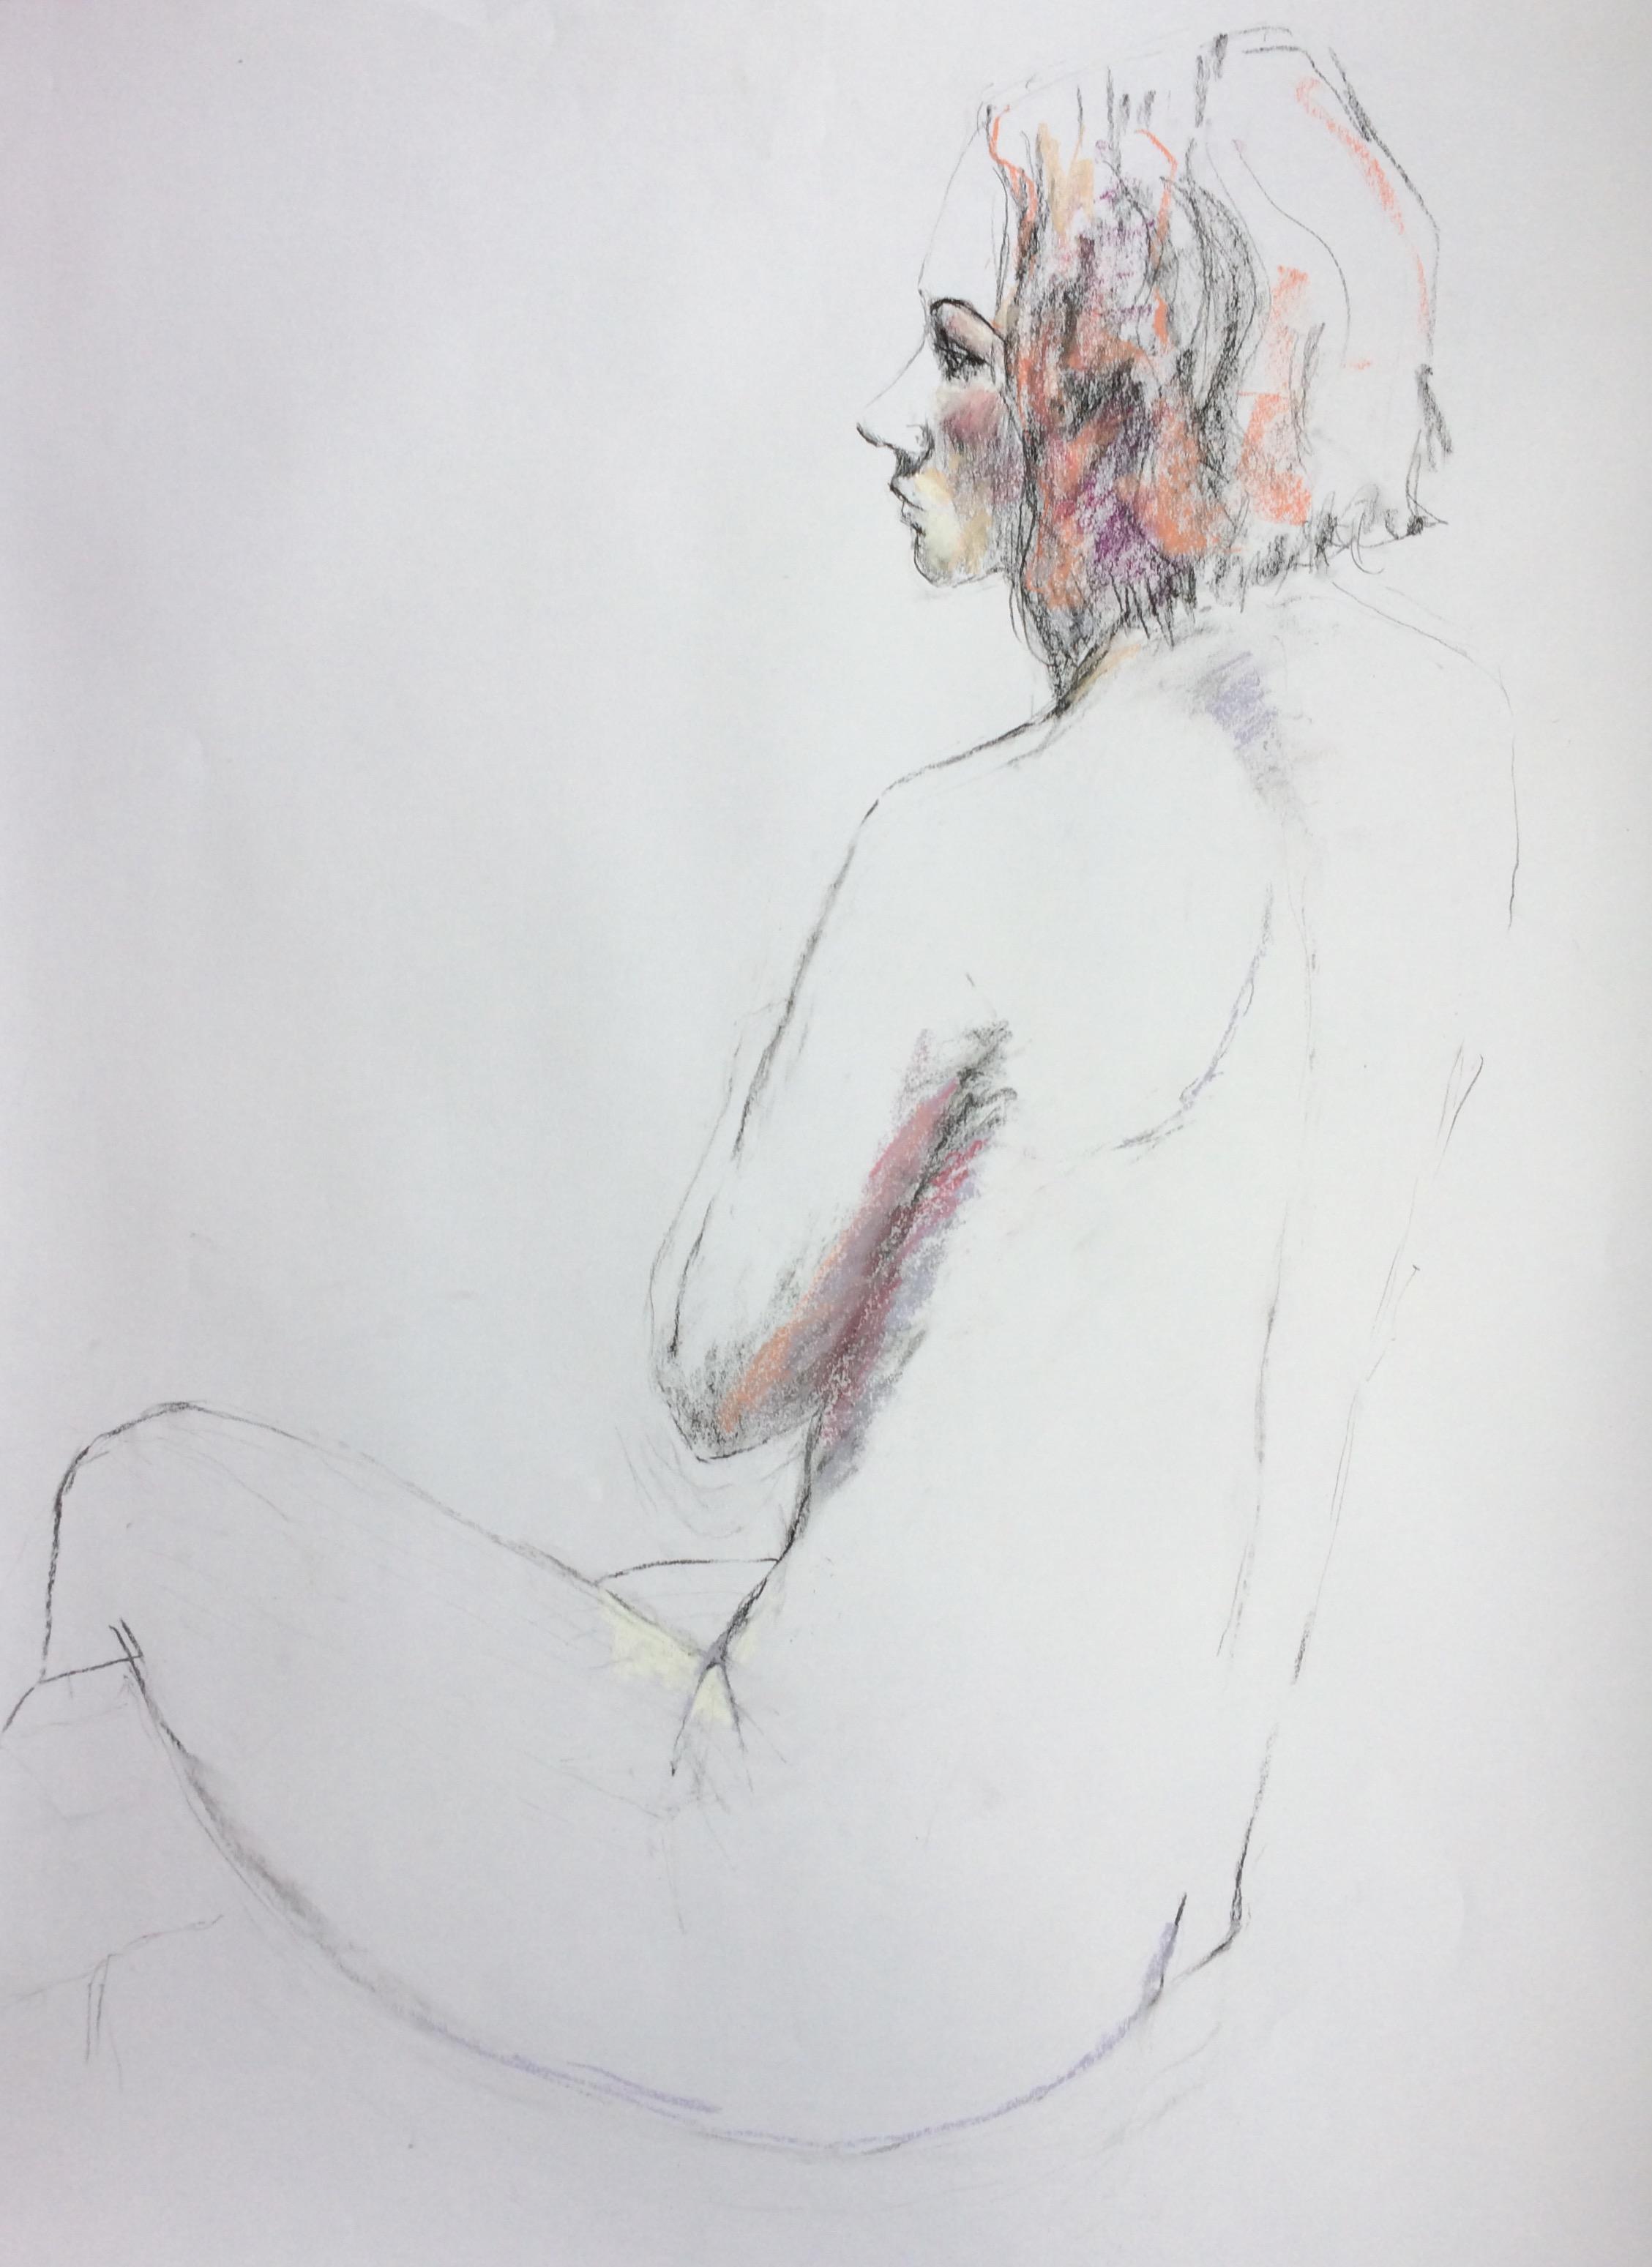 Pirita 84 x 60 cm Pastel on Paper